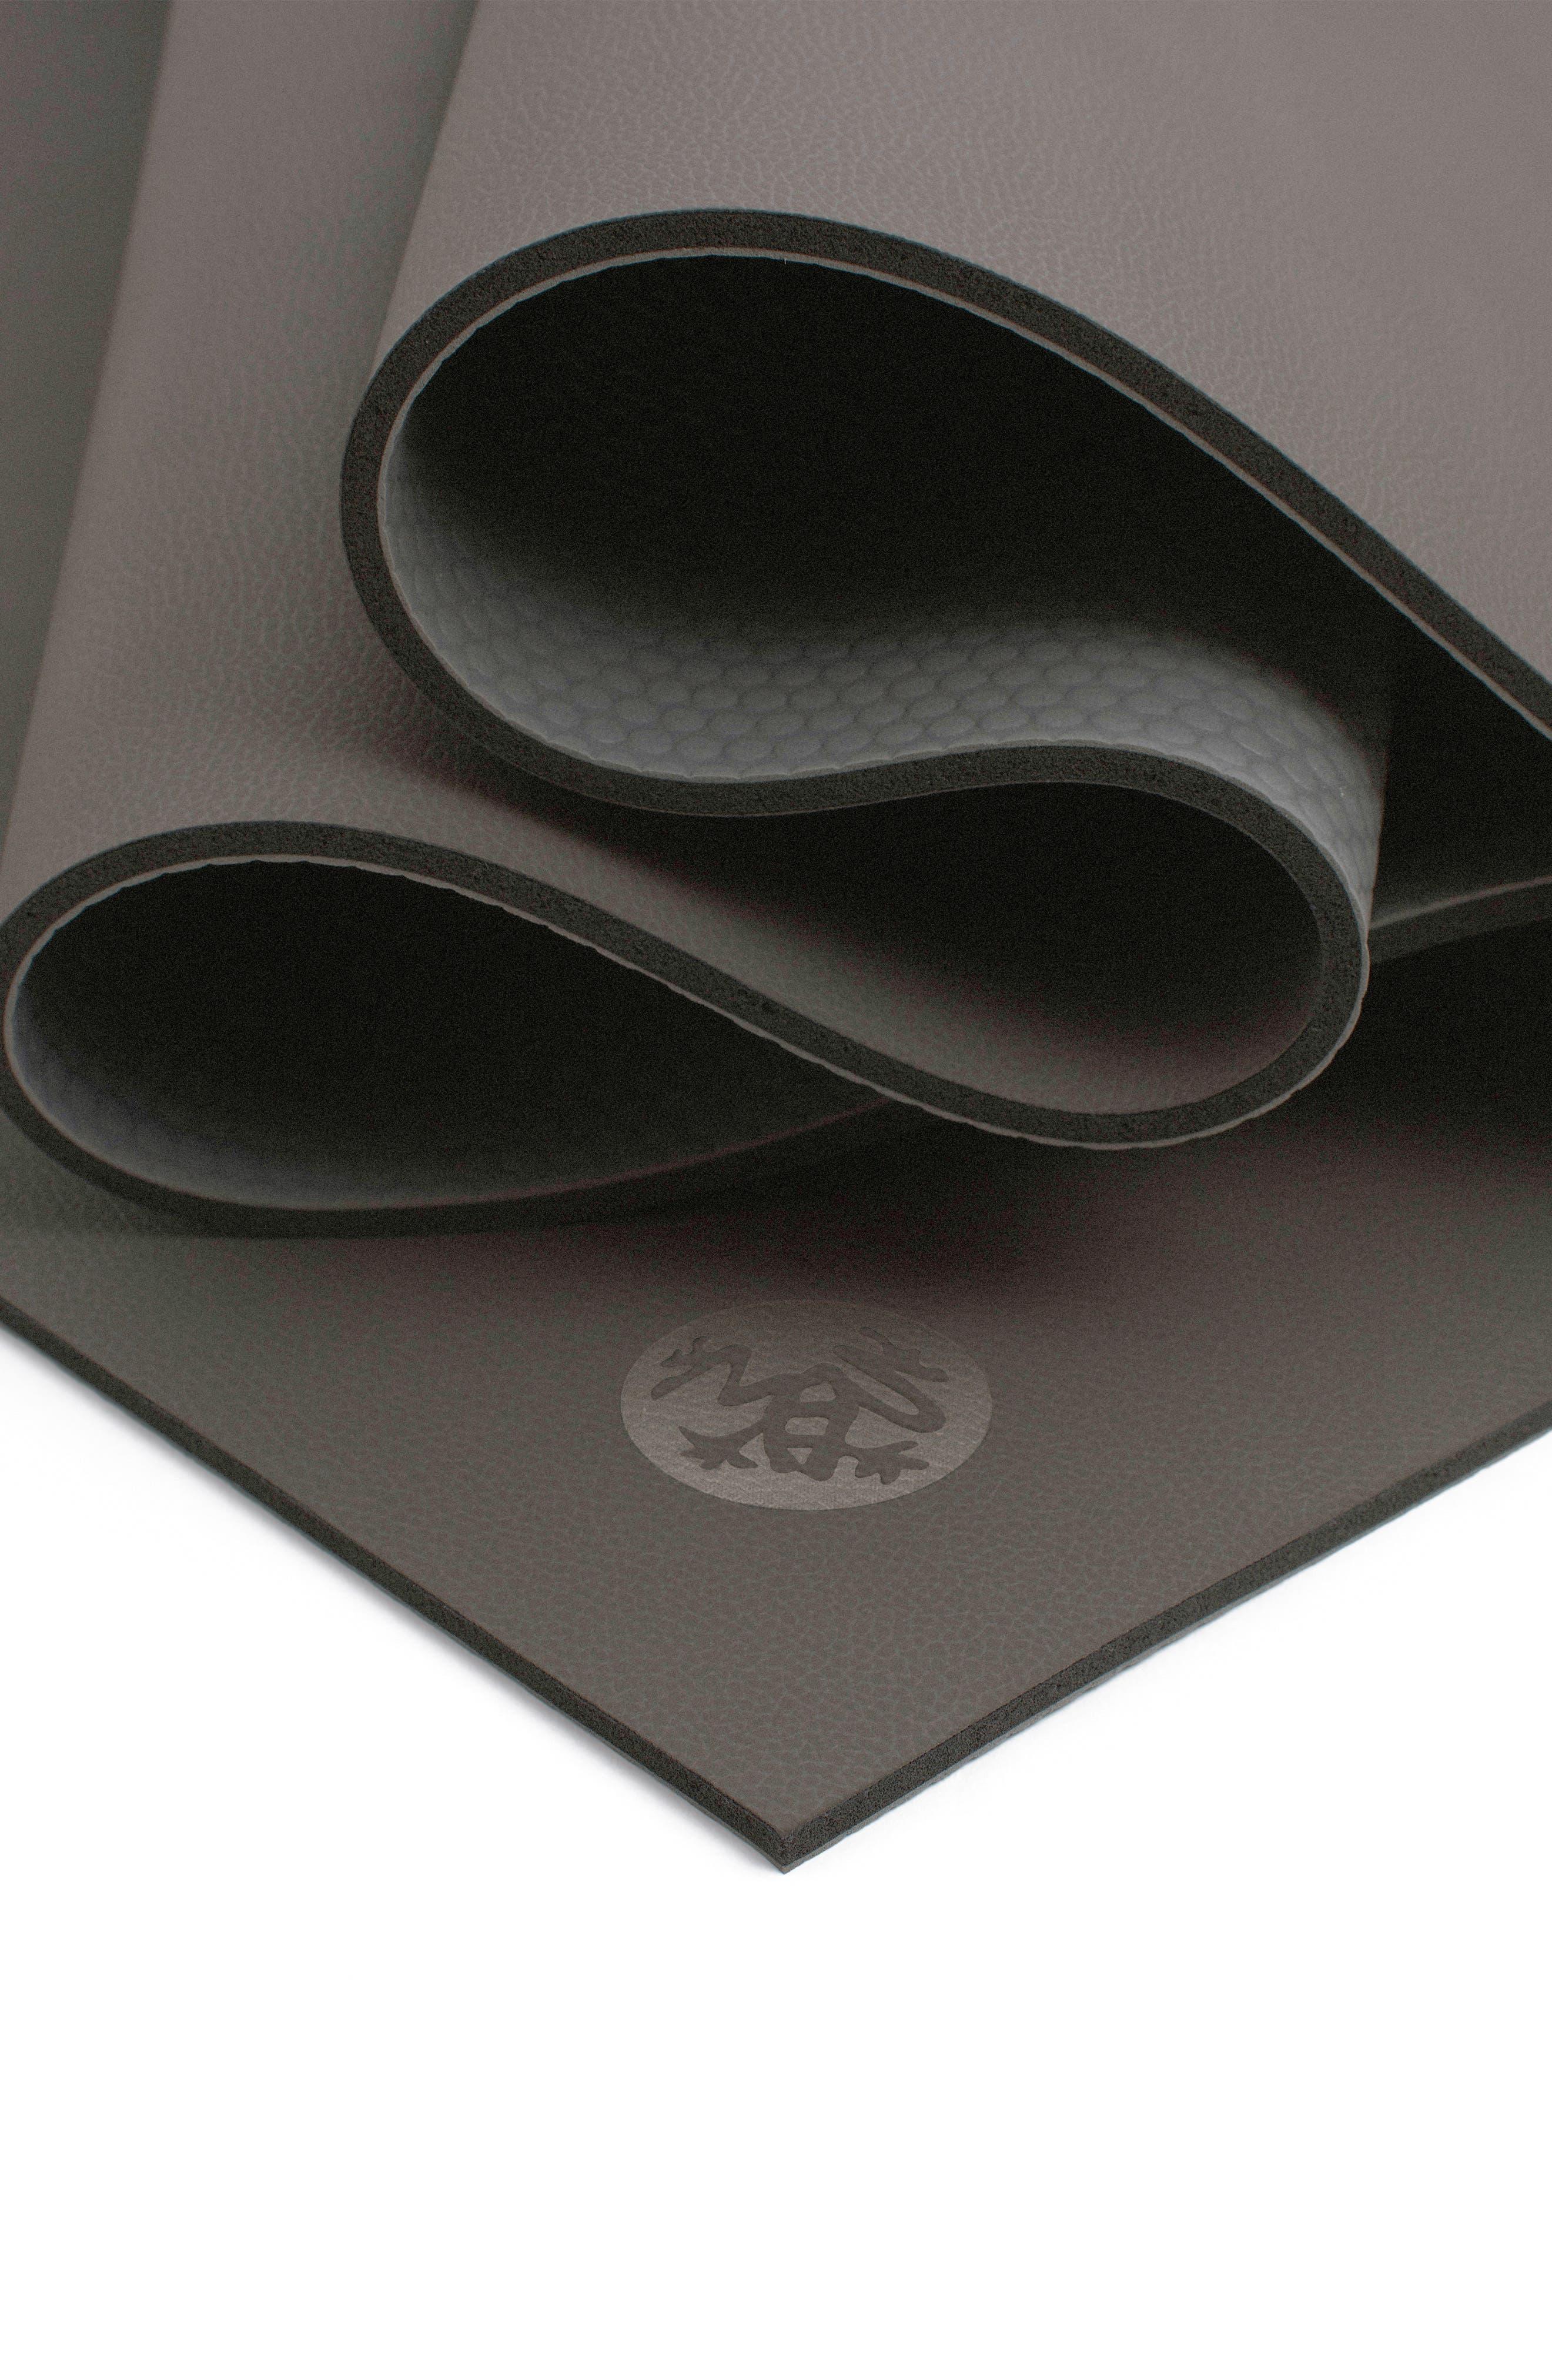 GRP<sup>®</sup> Yoga Mat,                             Alternate thumbnail 4, color,                             020